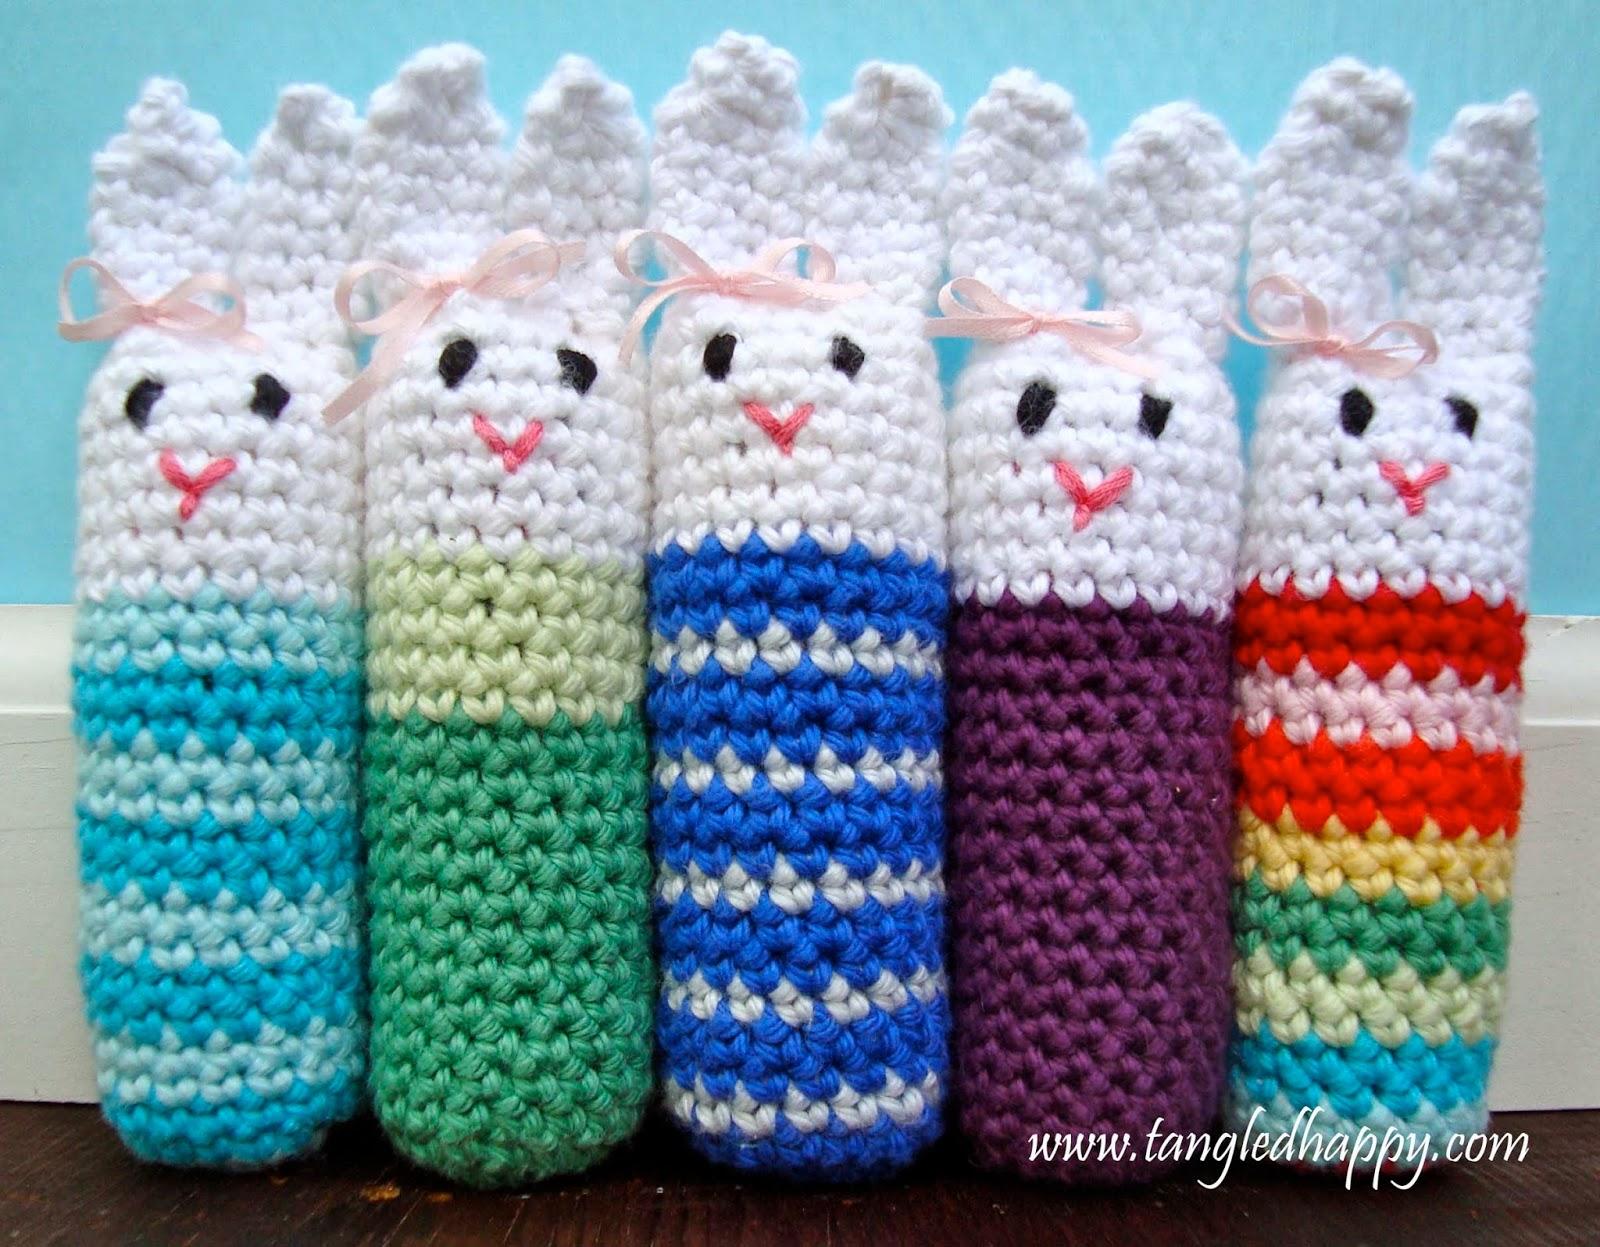 Amigurumi Easy Free : tangled happy: How To Crochet An Easy Amigurumi Bunny ...